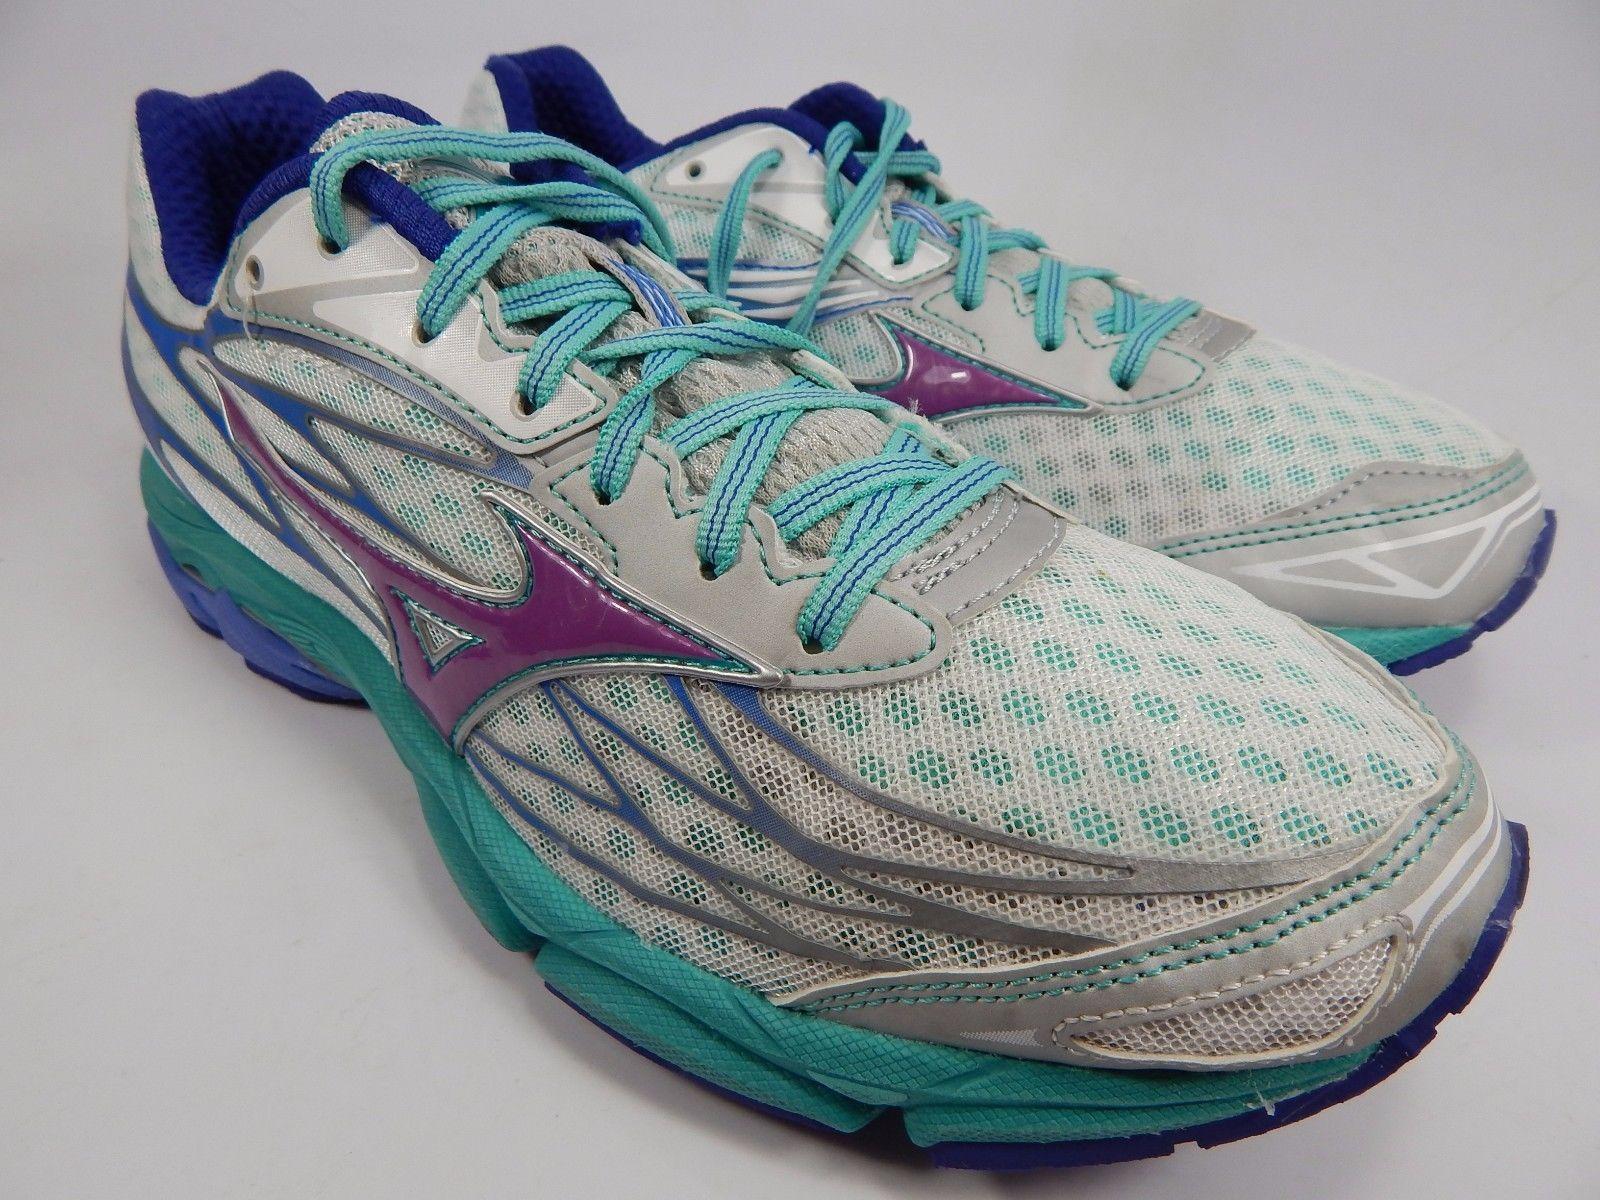 Mizuno Wave Catalyst Women's Running Shoes Size US 10 M (B) EU 41 White Green